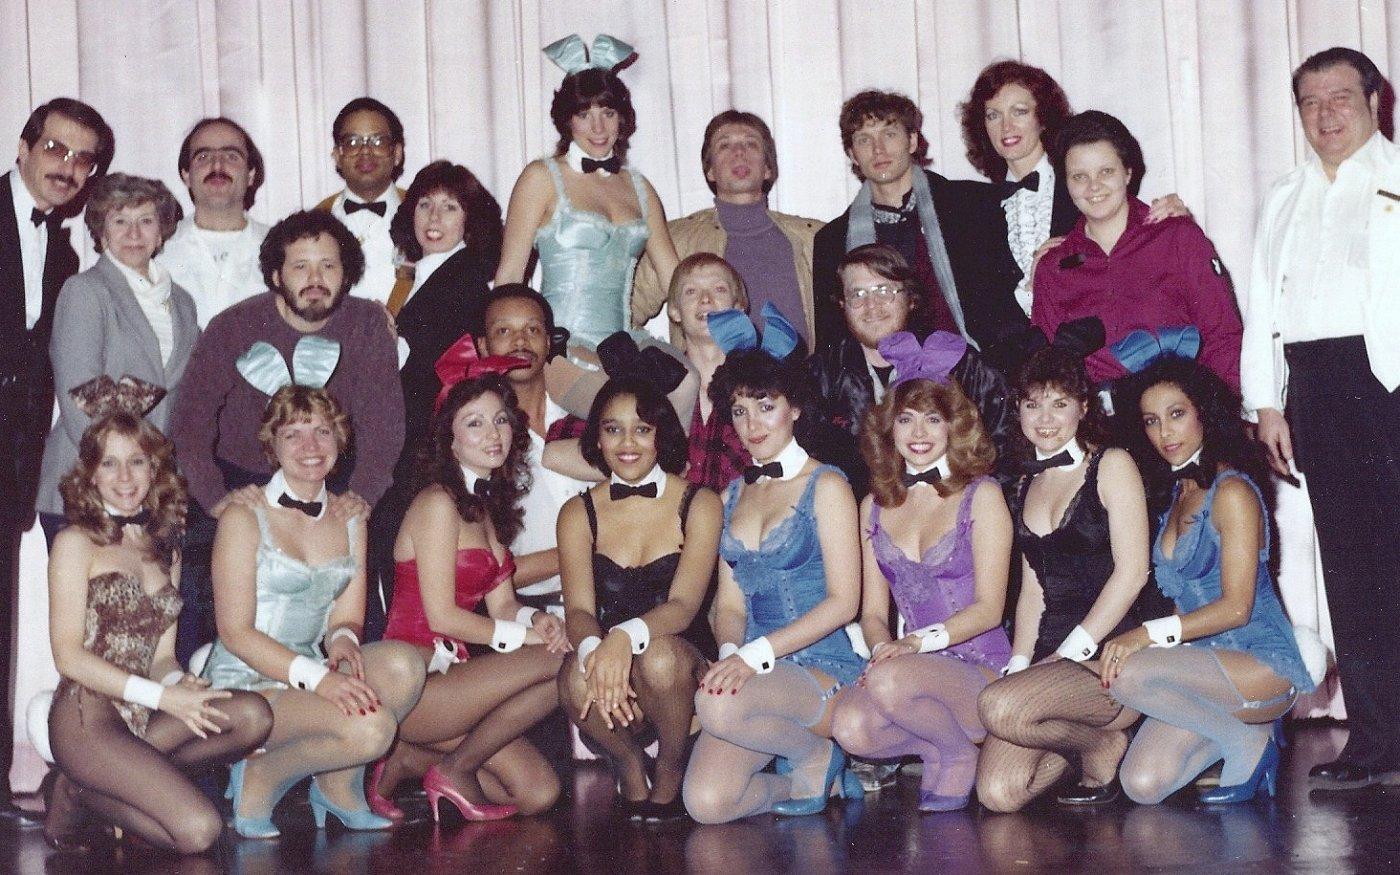 Atlantic City Playboy Club, Hotel and Casino